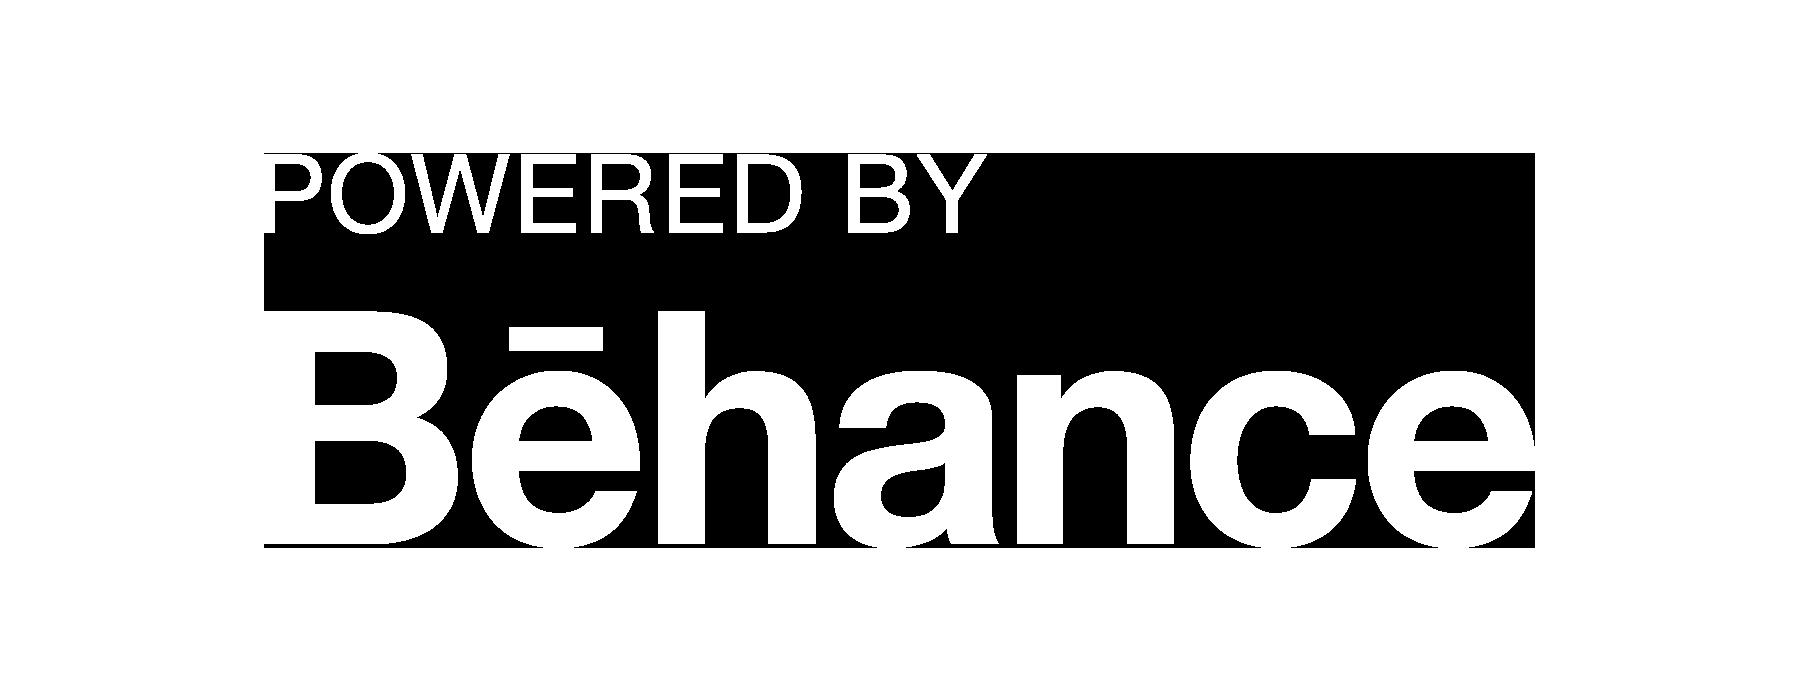 Behance_logo_white_by_rafaljankos_power